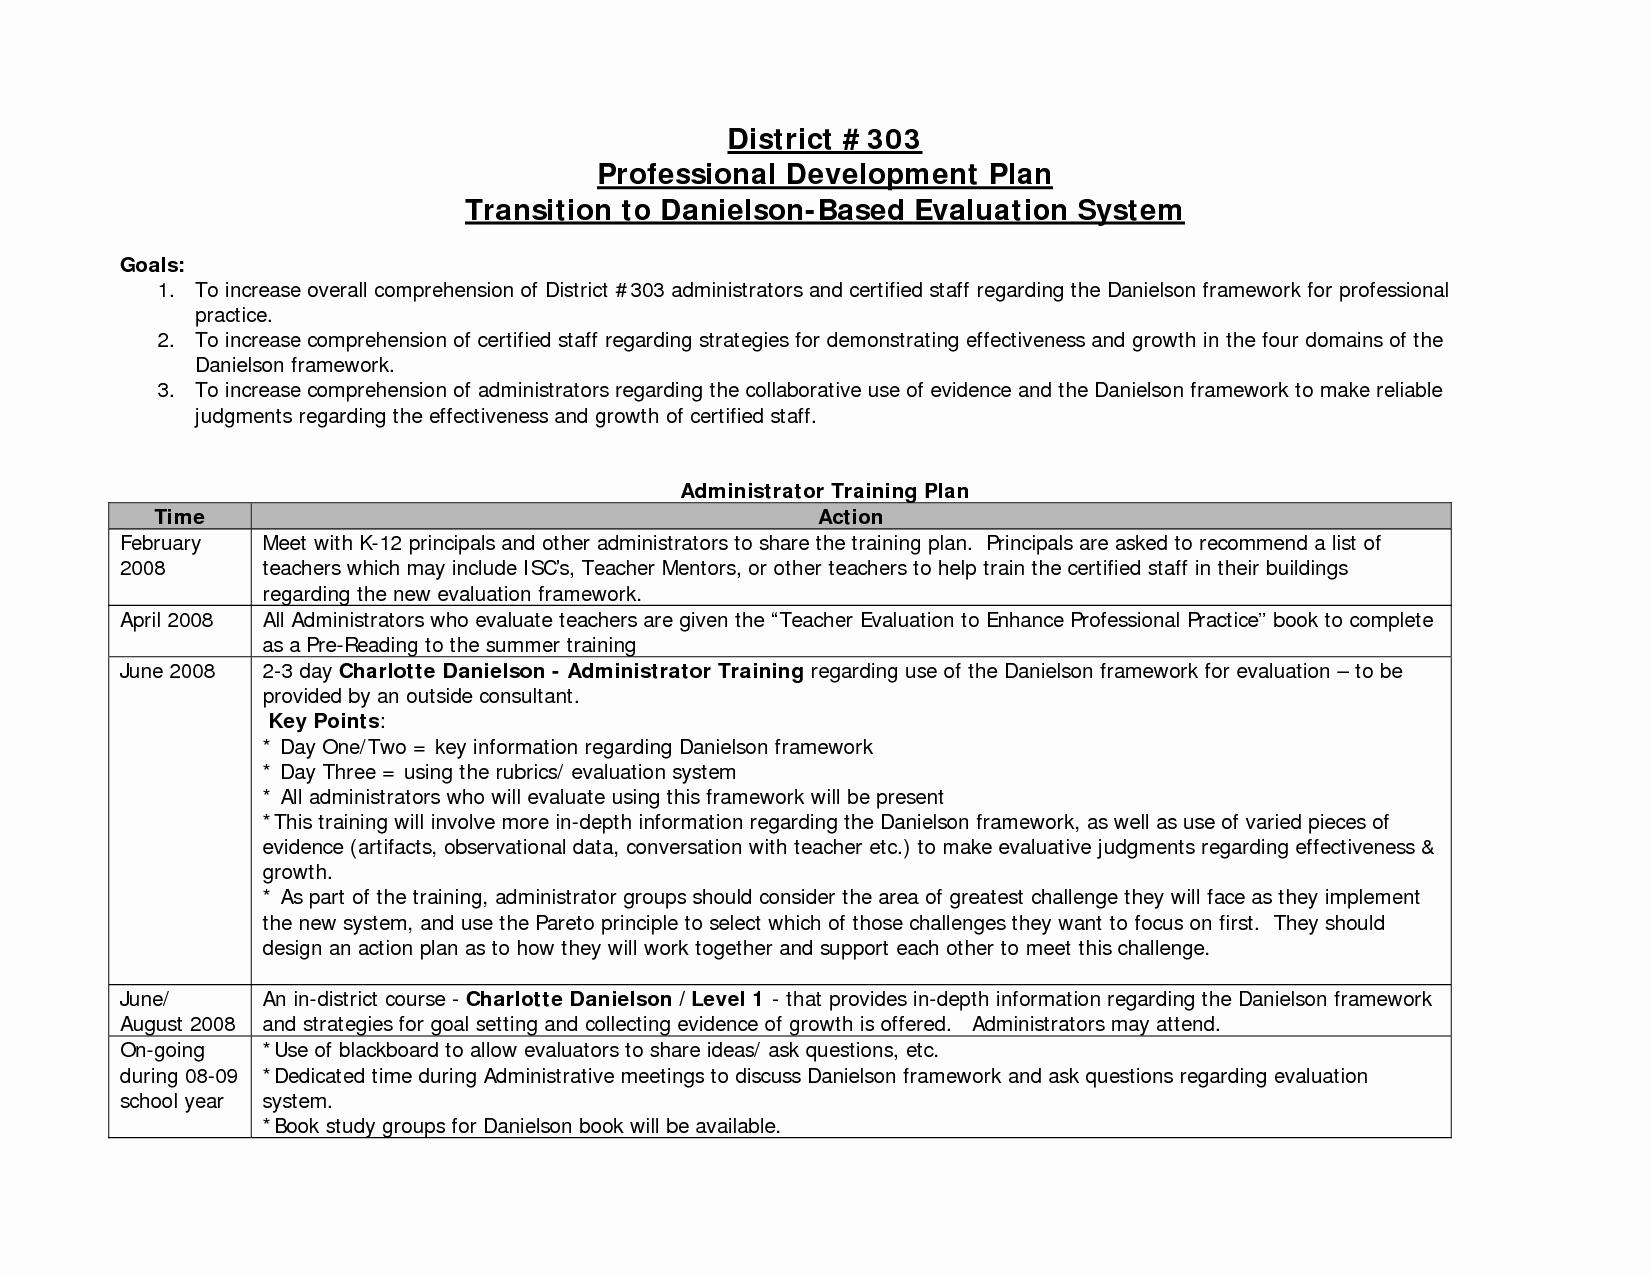 Professional Development Plan for Teachers Example Awesome Professional Development Plan Example for Teachers